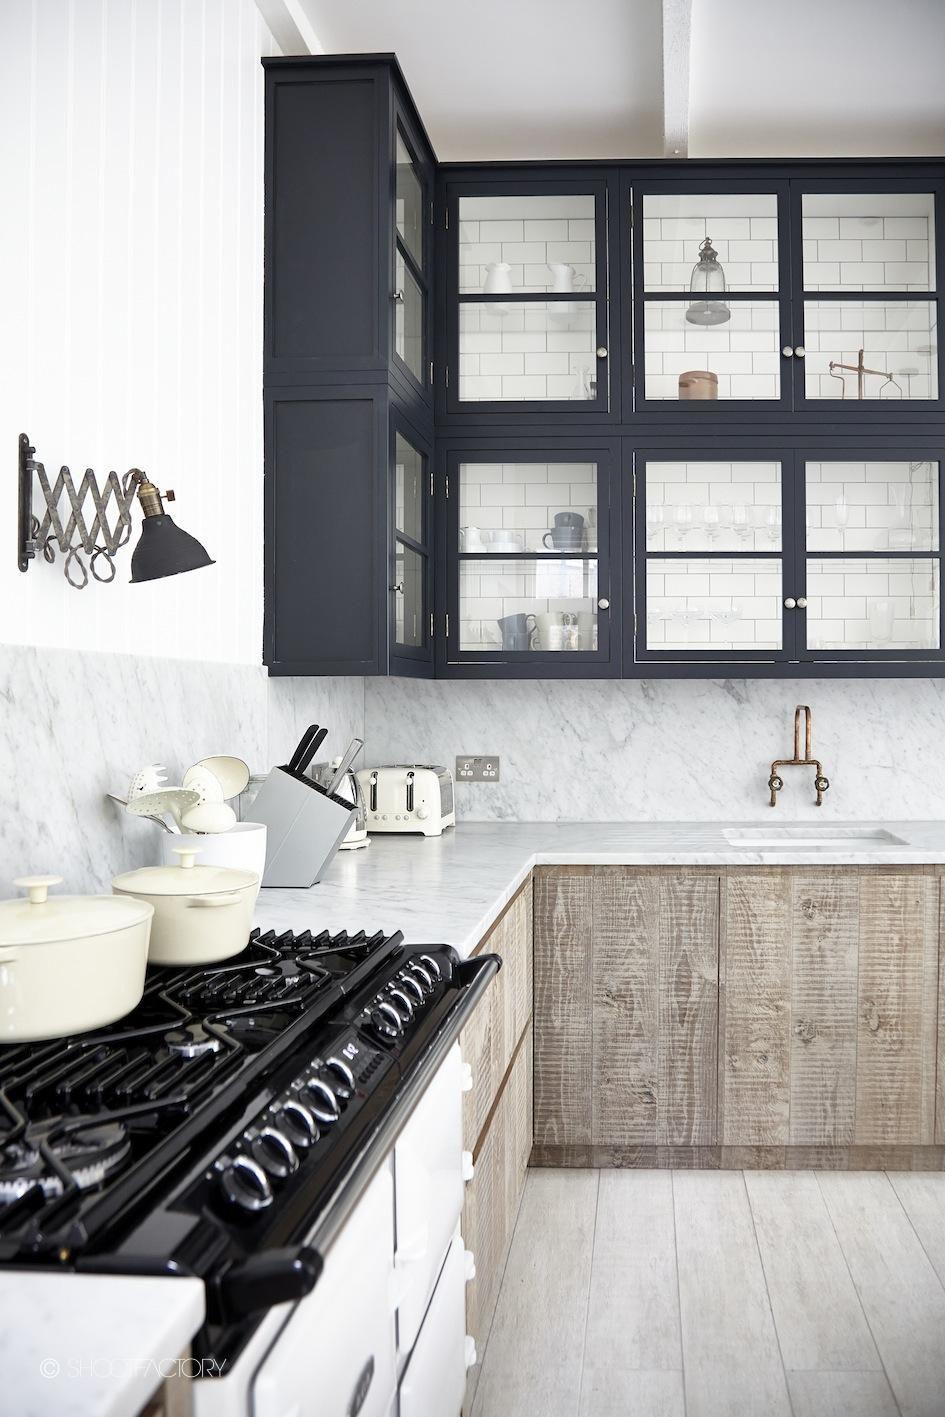 Pin by rebecca boström on kitchen inspiration pinterest subway